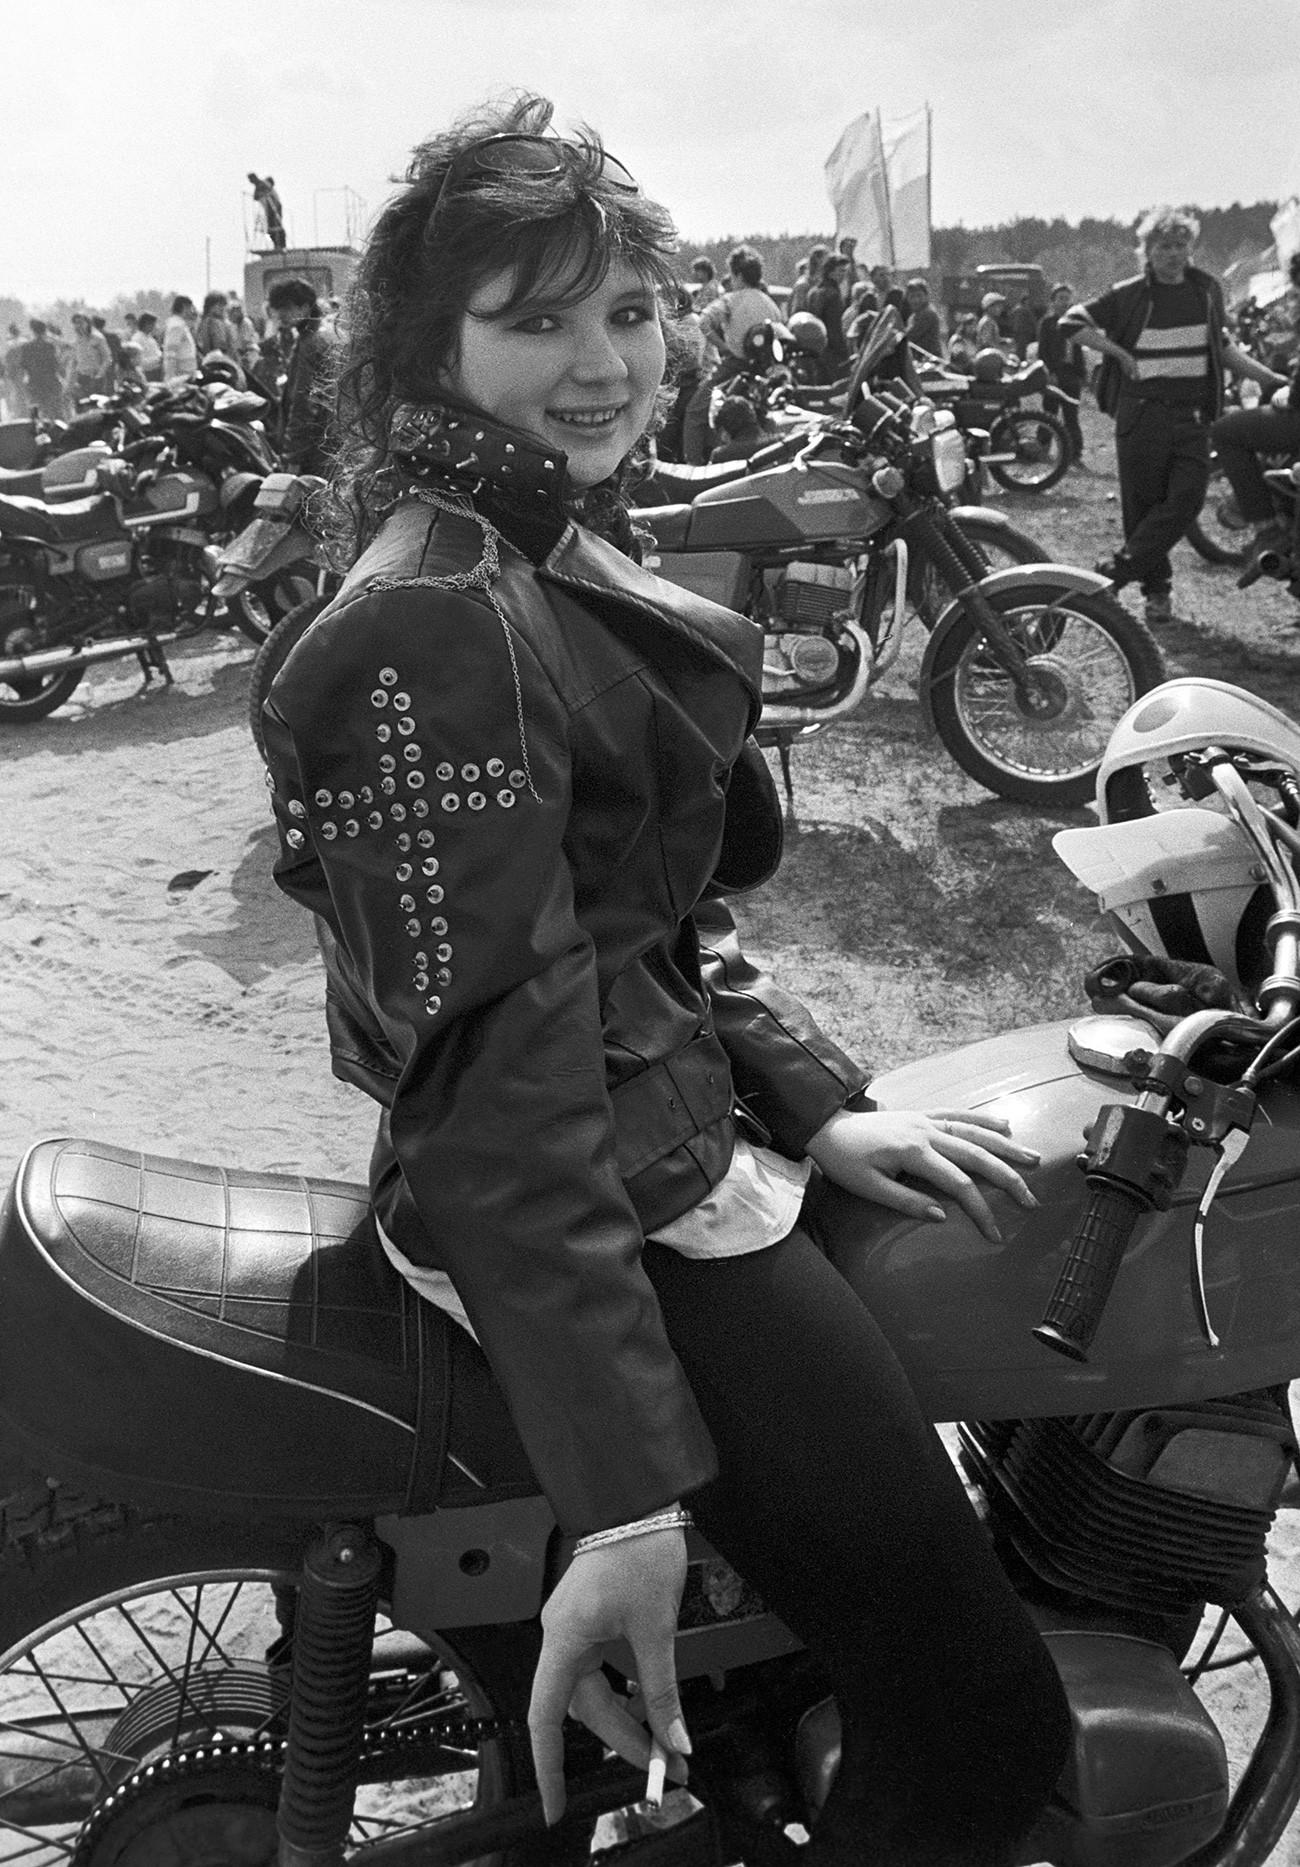 Seorang anggota geng motor perempuan berpose.